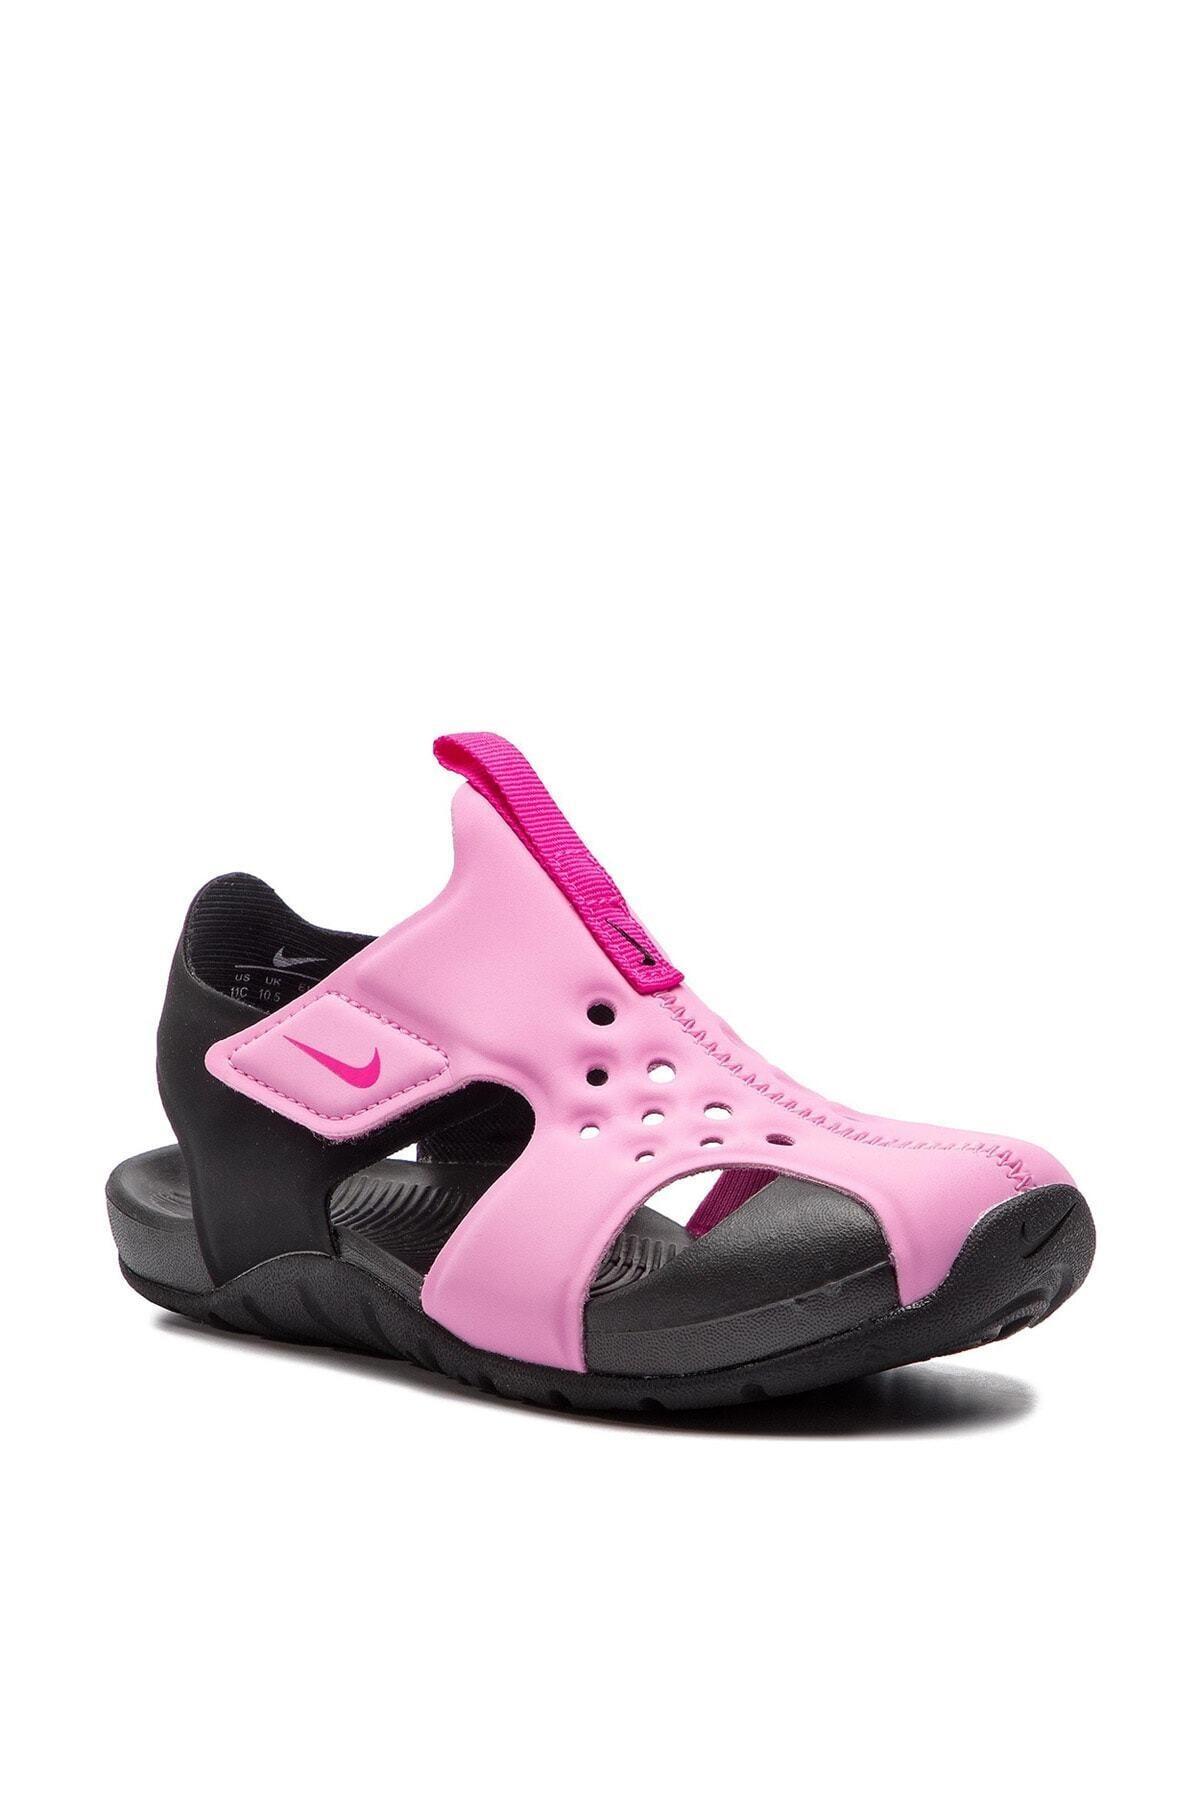 Nike Kids Pembe 943826-602 Sunray Protect Çocuk Sandalet 1